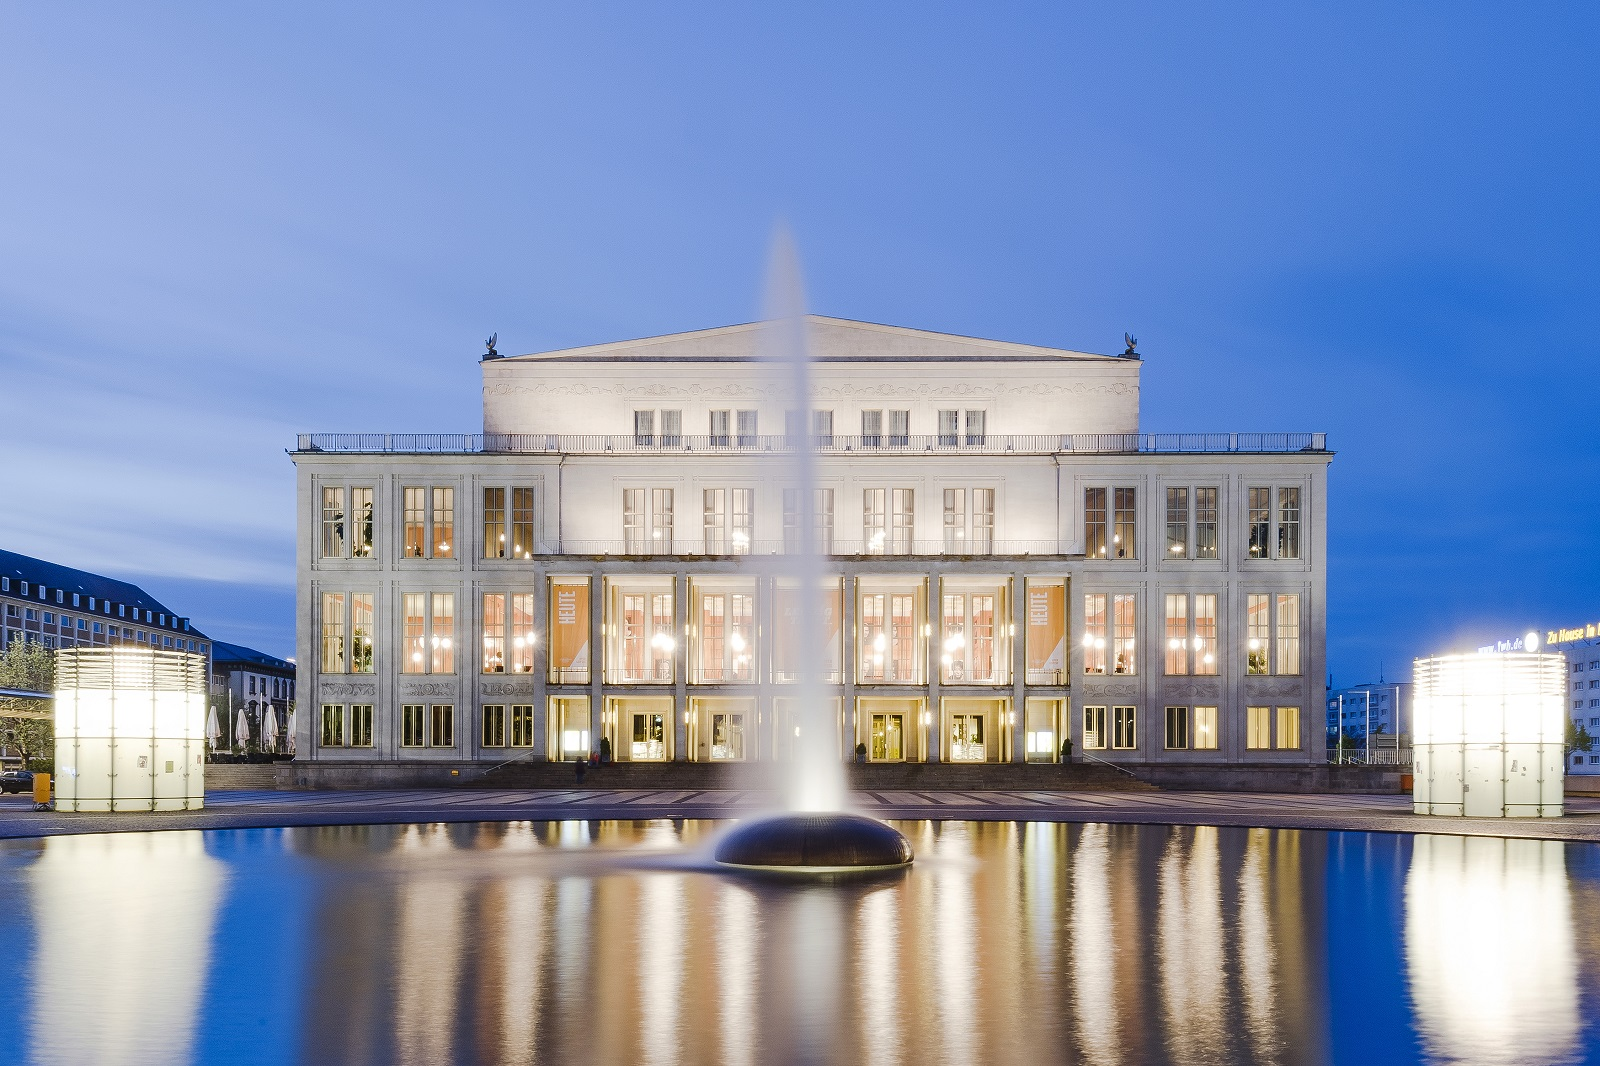 Лейпцигская опера / Oper Leipzig